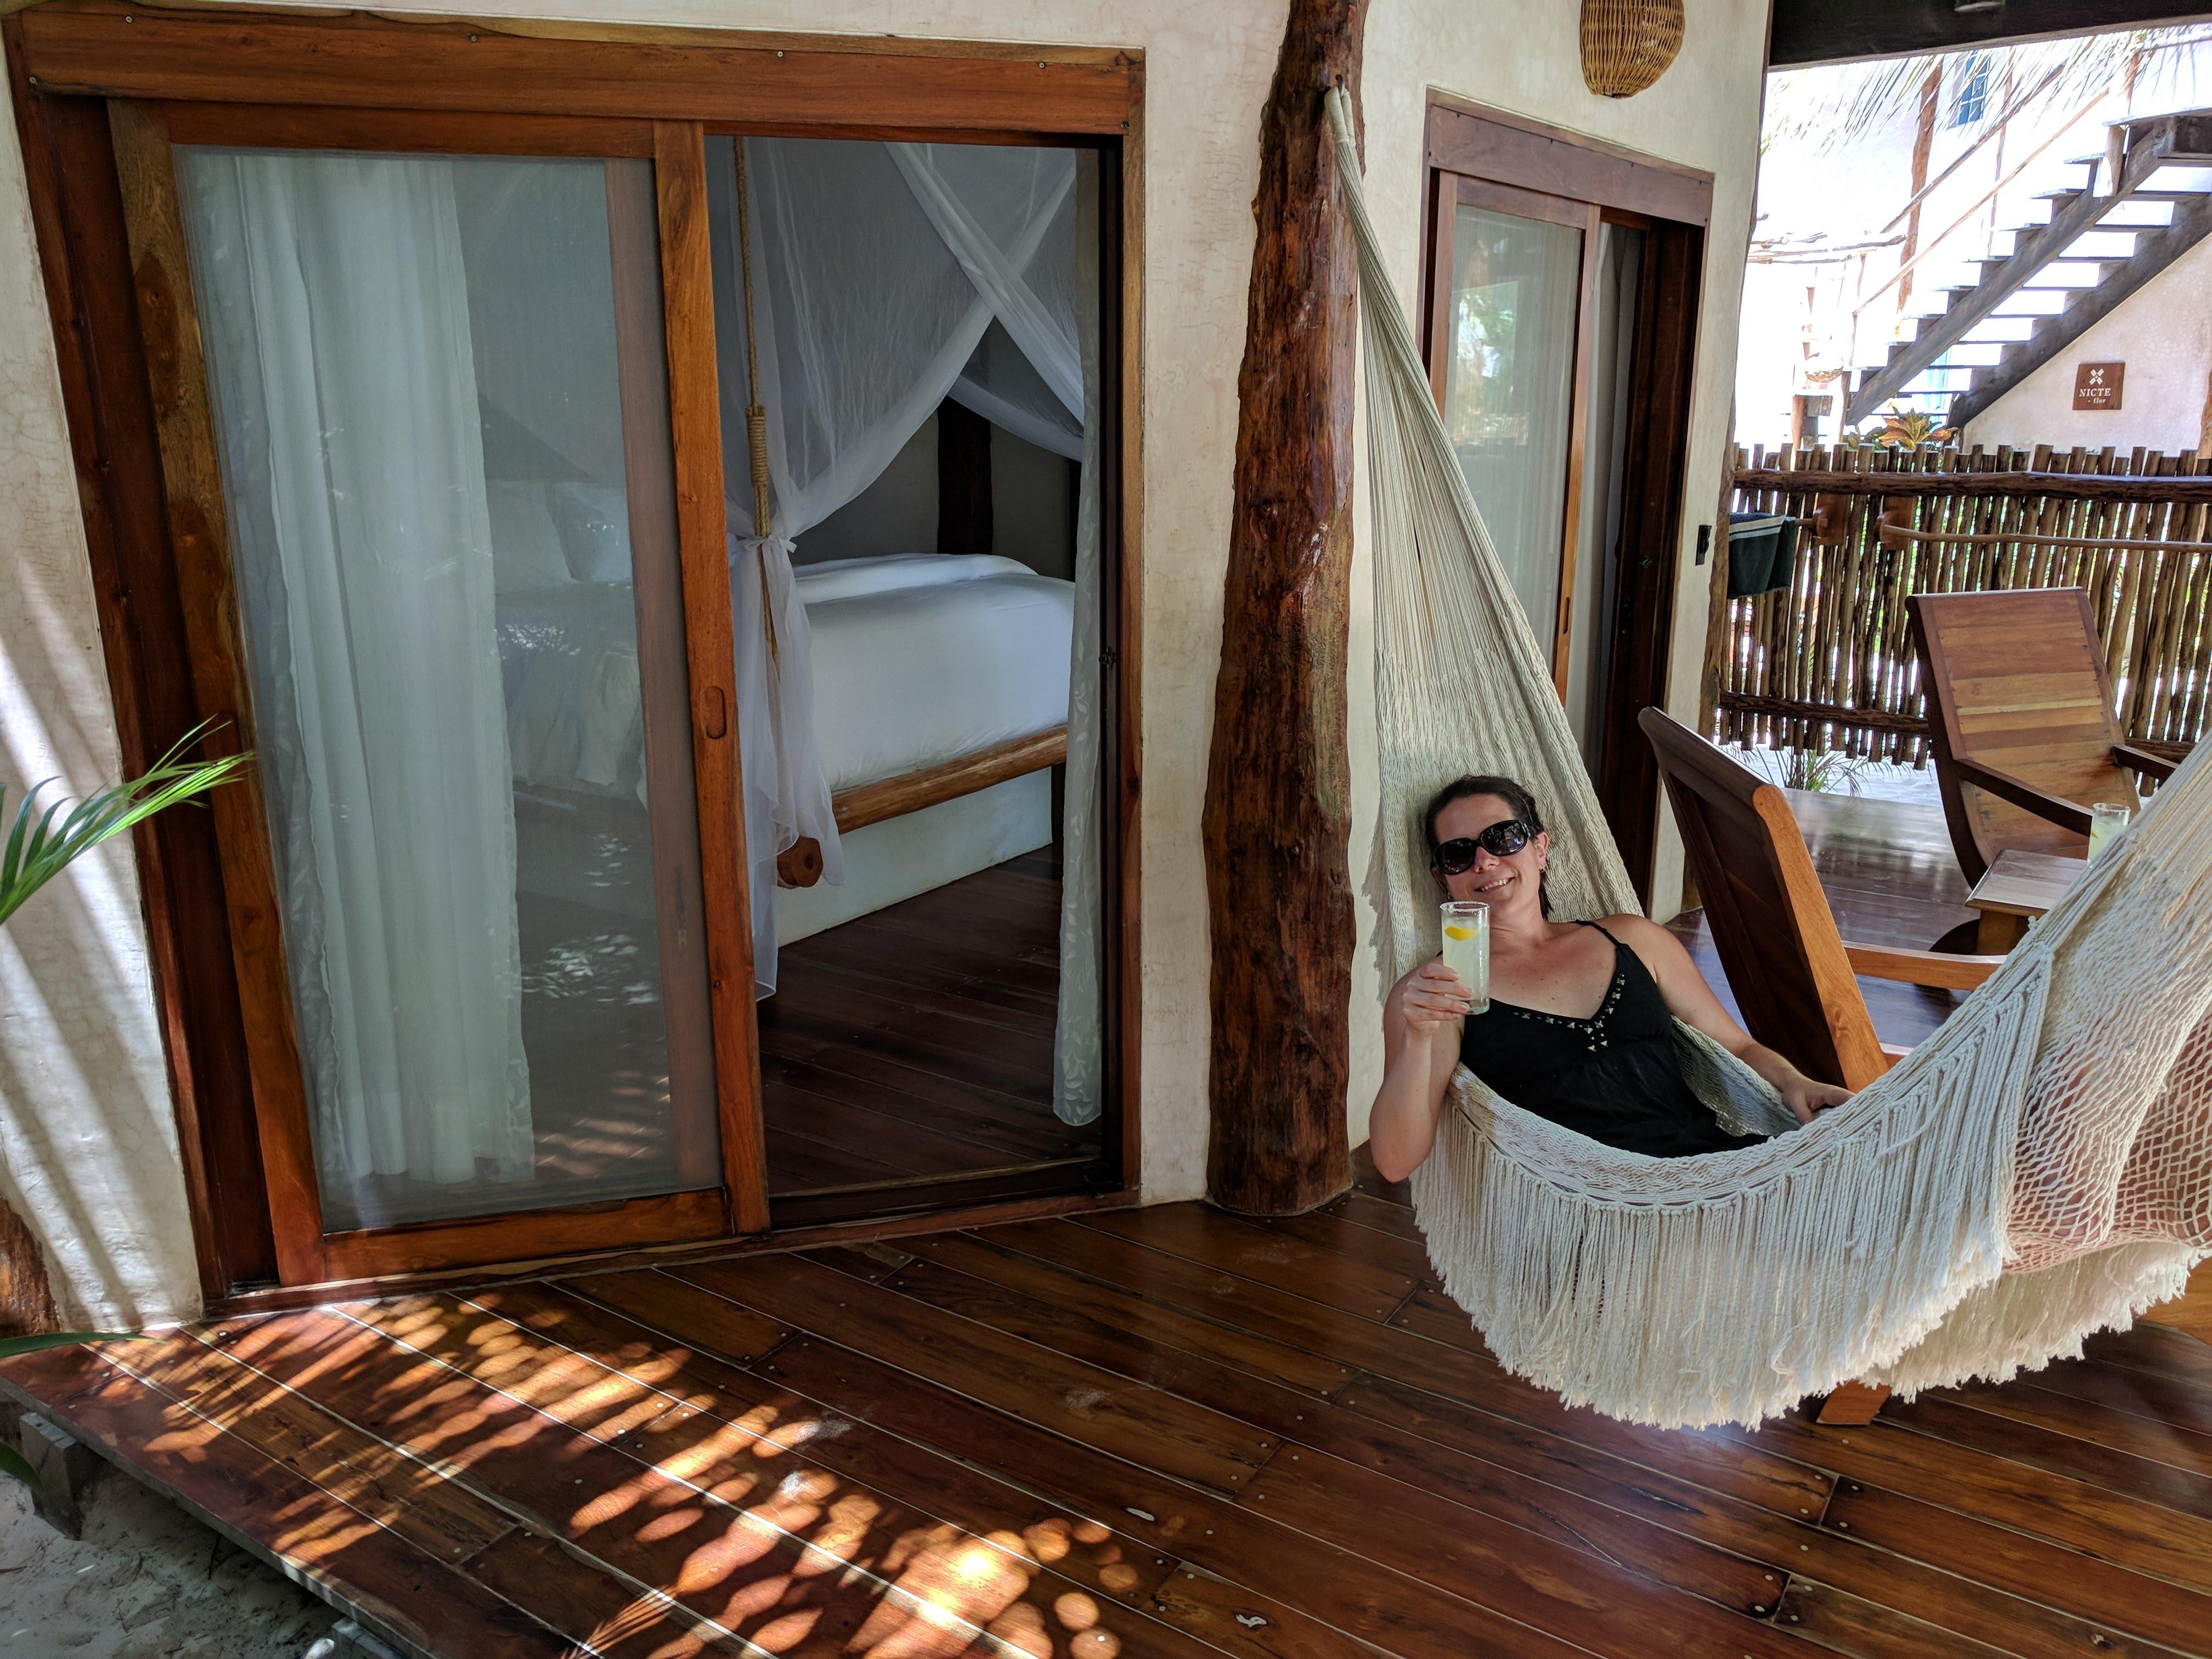 Enjoying the welcome margarita in a hammock